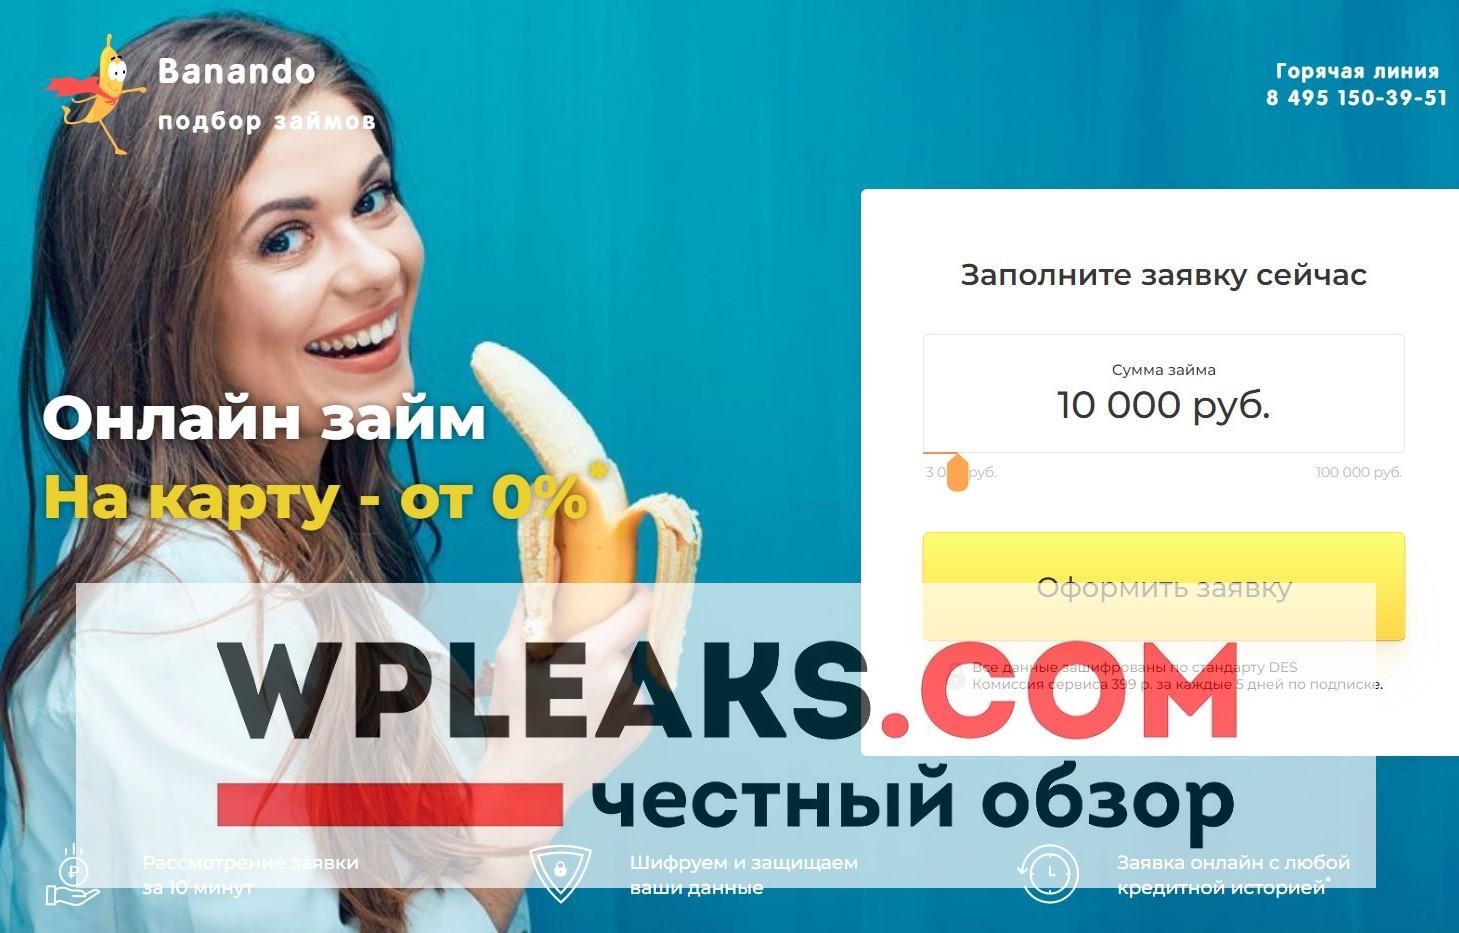 banando.ru отзывы